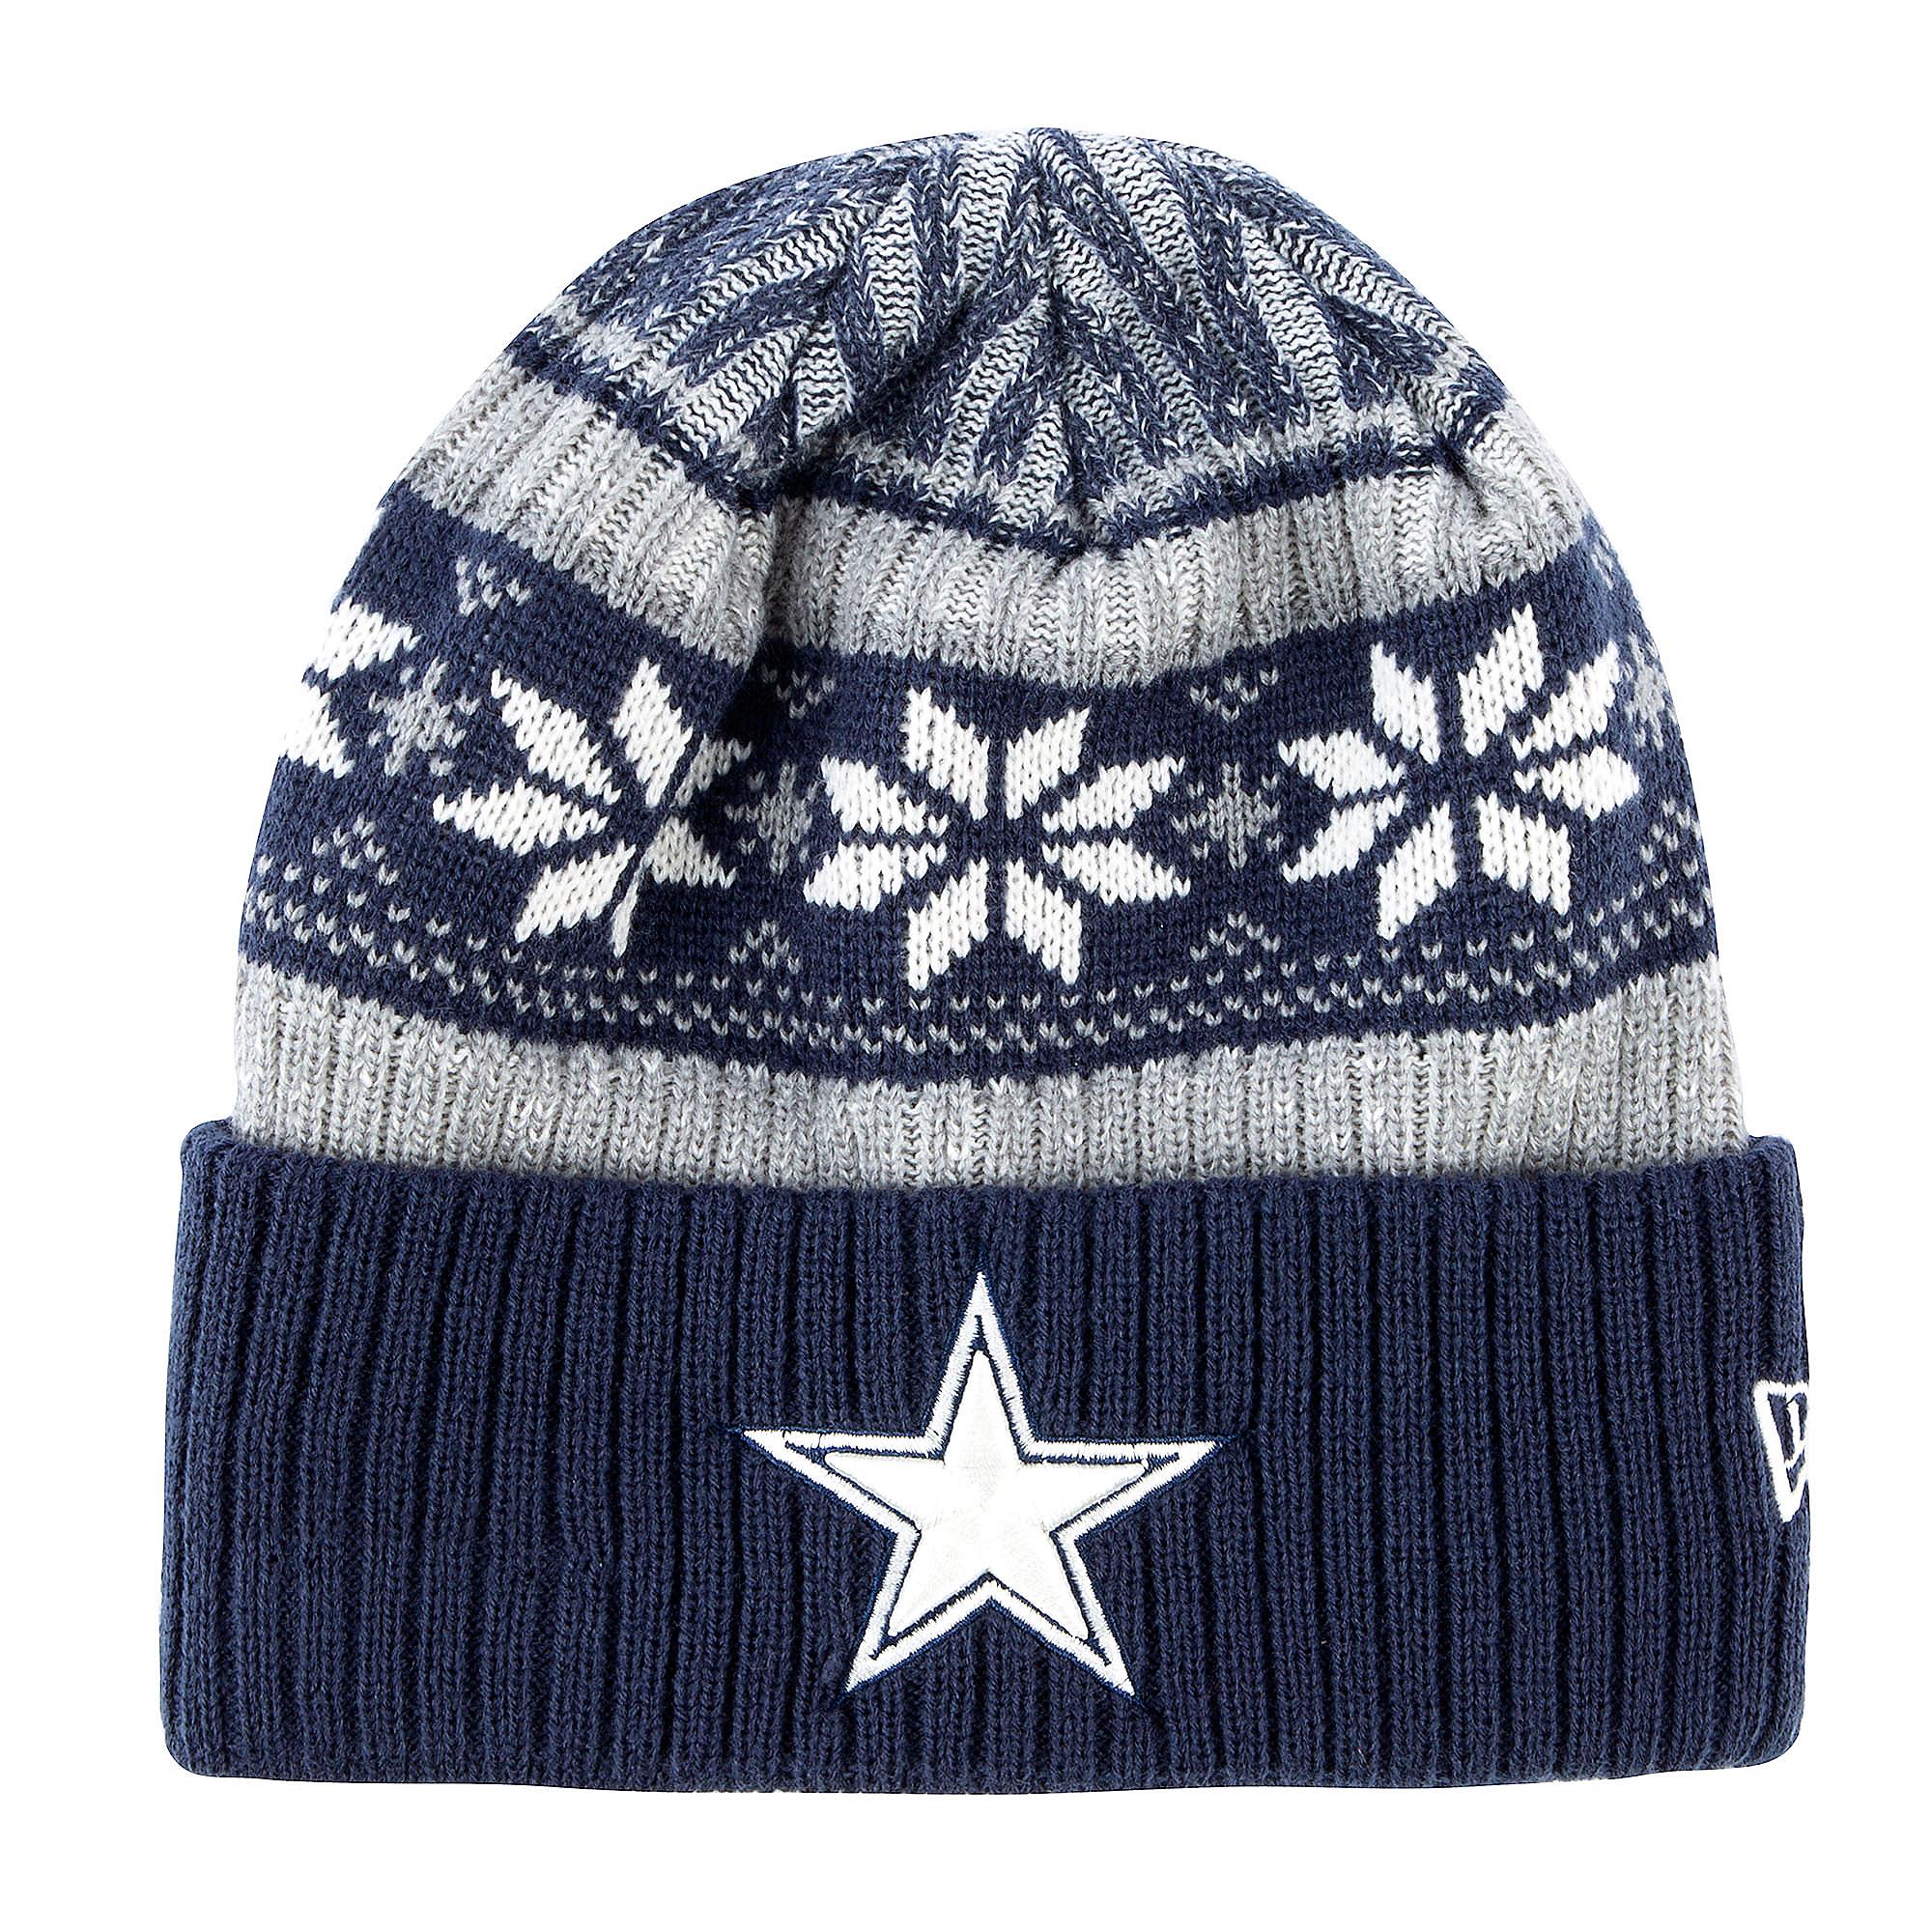 ... reduced dallas cowboys new era vintage cuff knit hat f5de3 16376 05ab082466c7